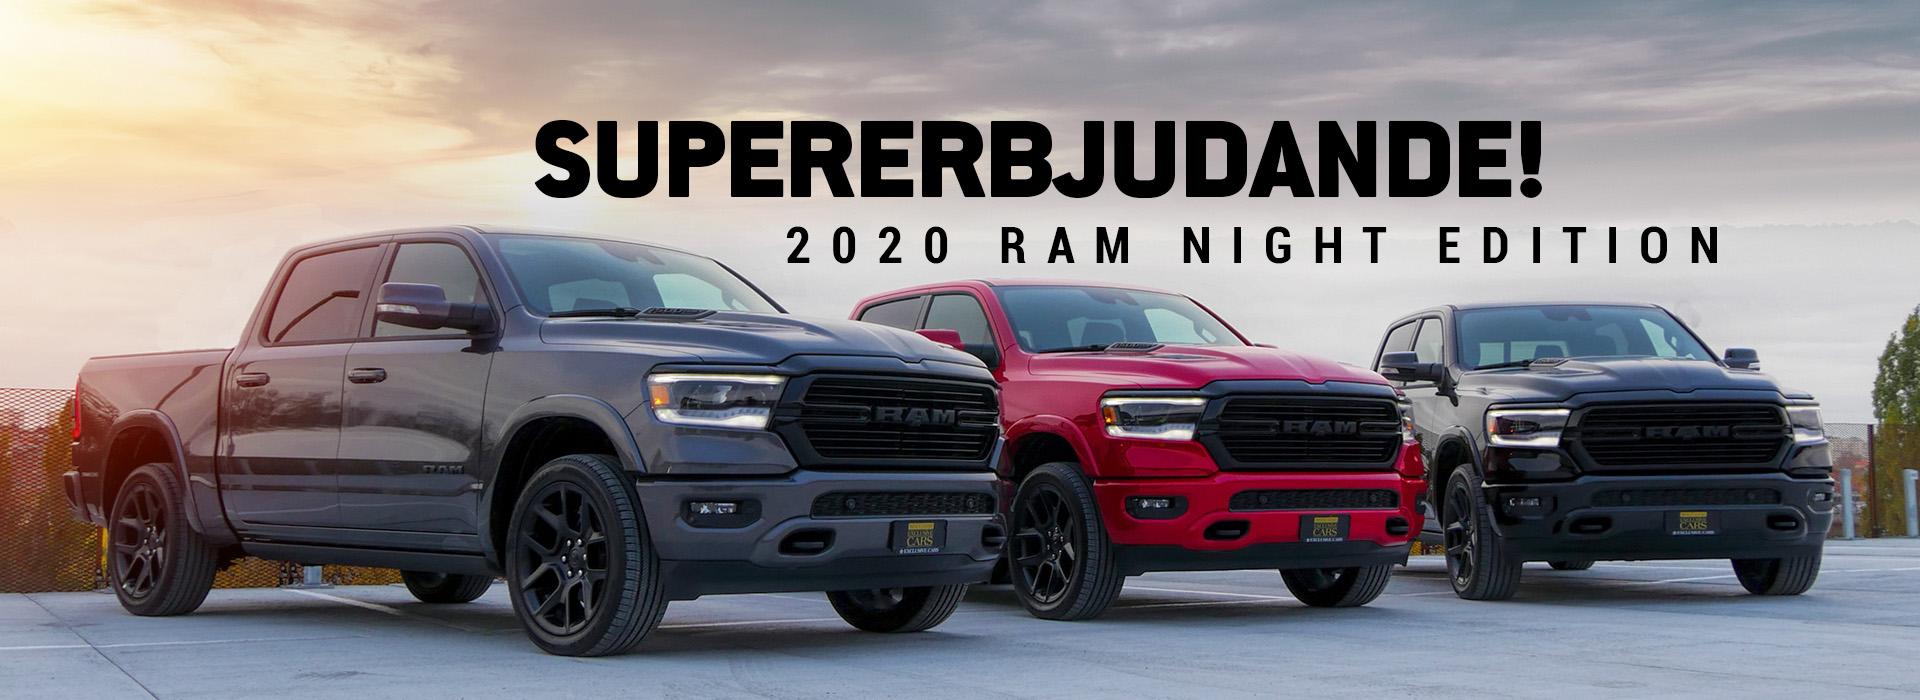 2020 Ram Night Edition